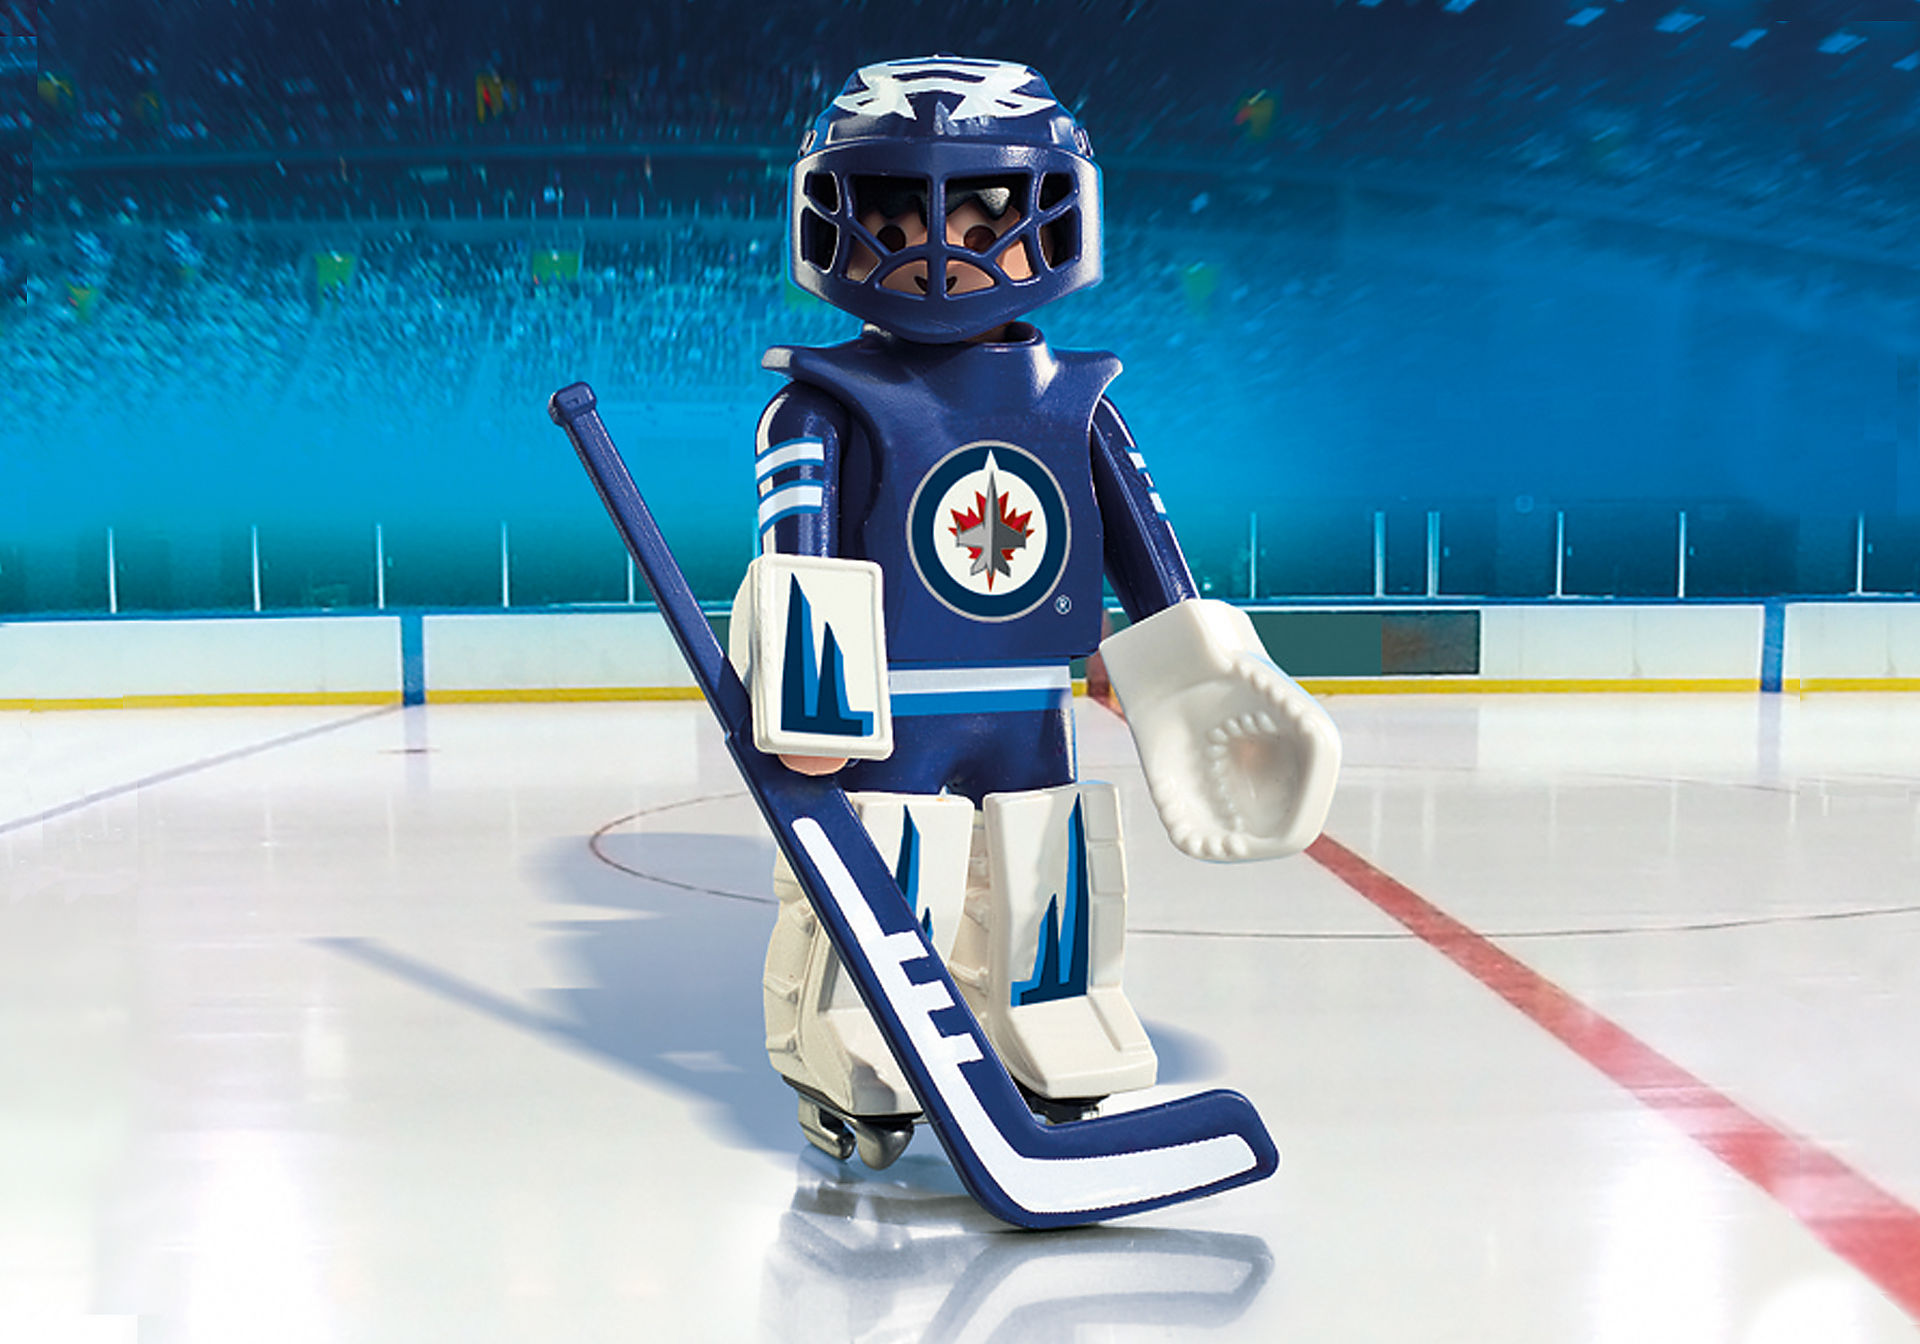 9020 NHL™ Winnipeg Jets™ Goalie zoom image1